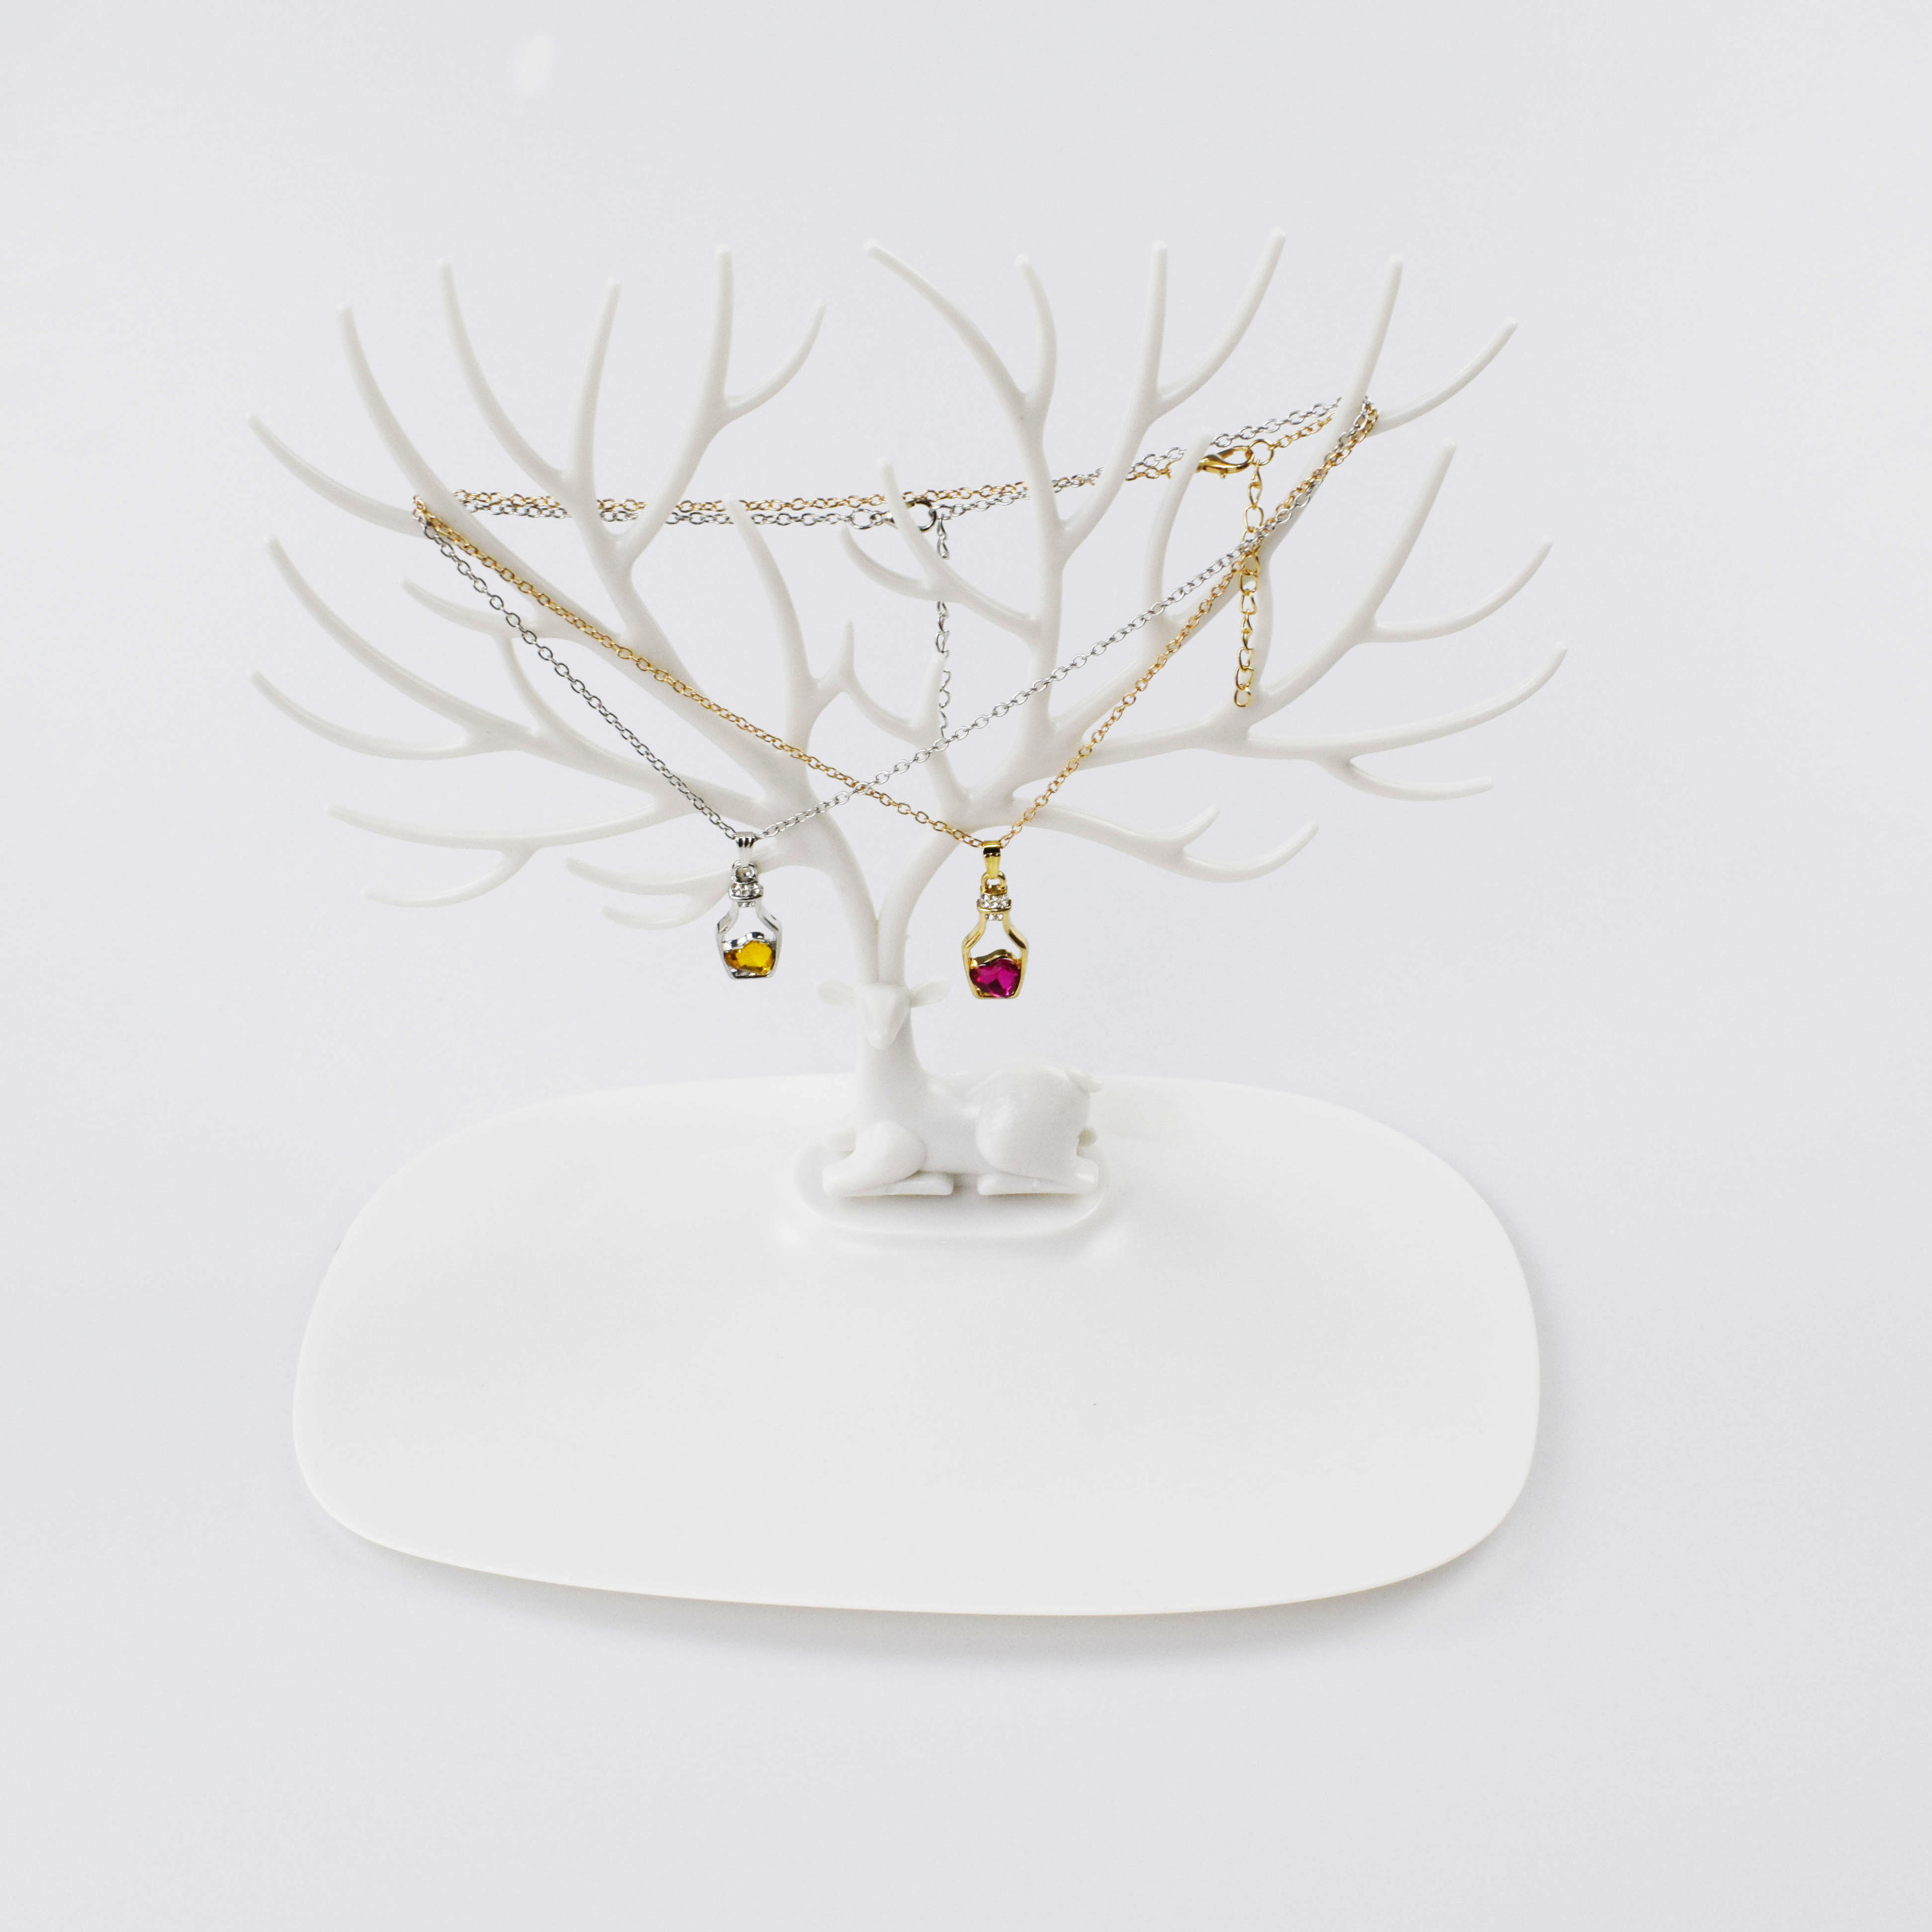 White Necklace Holder Bracelet Stand Jewelry Organizer Jewelry Tree Decorative Deer Antler Tree Design Jewelry Packaging Display Aliexpress